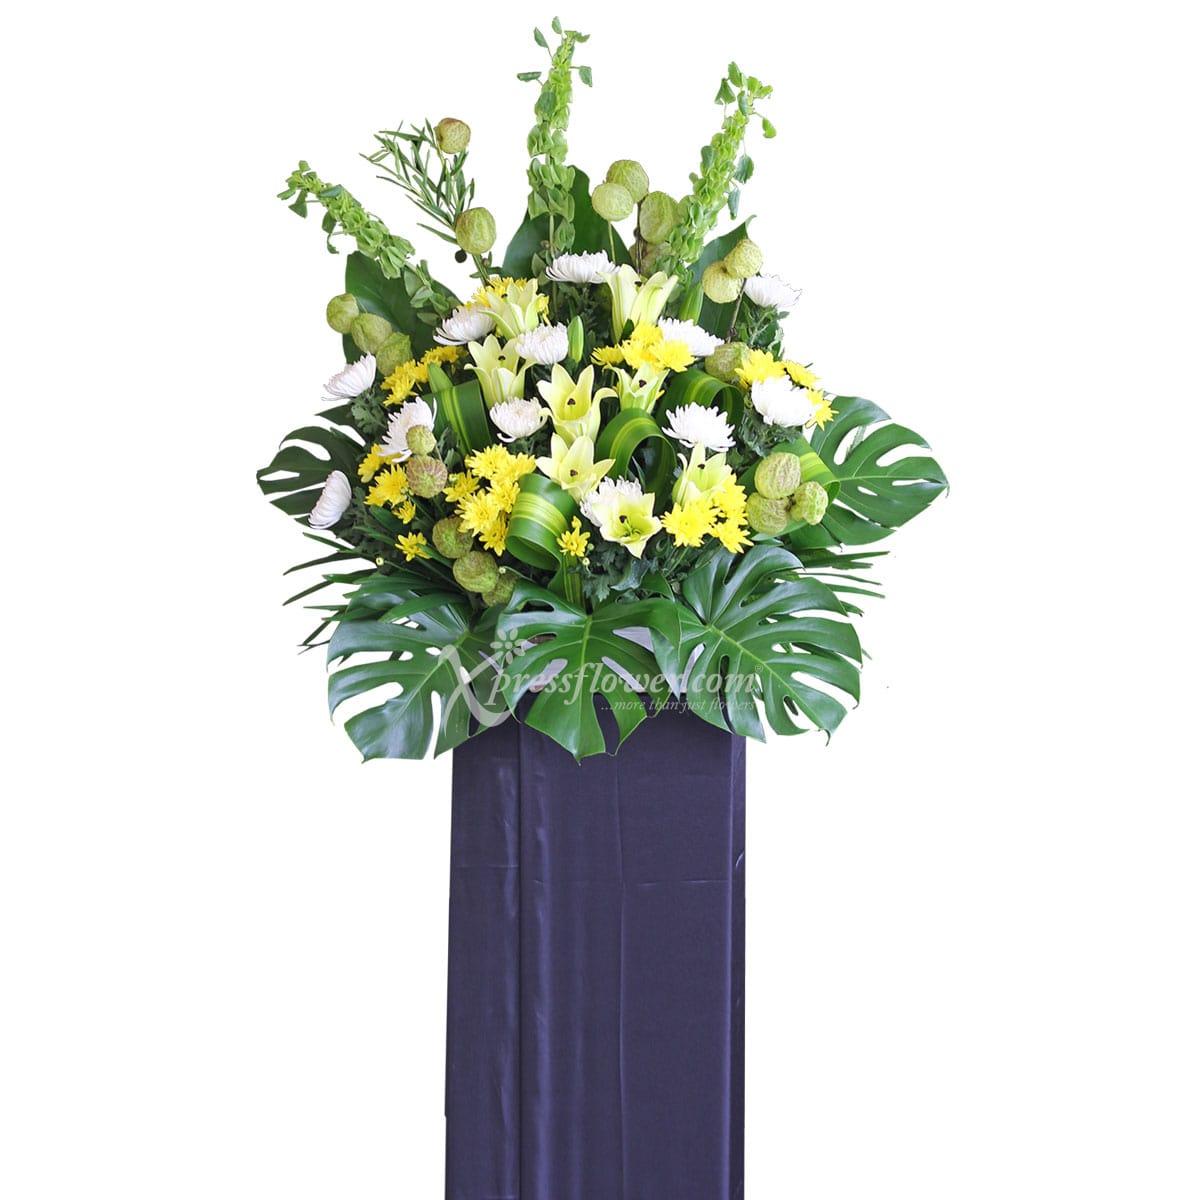 SC1717 Peaceful Departure Yellow Gerberas Wreath Funeral & Condolence Flower Stands